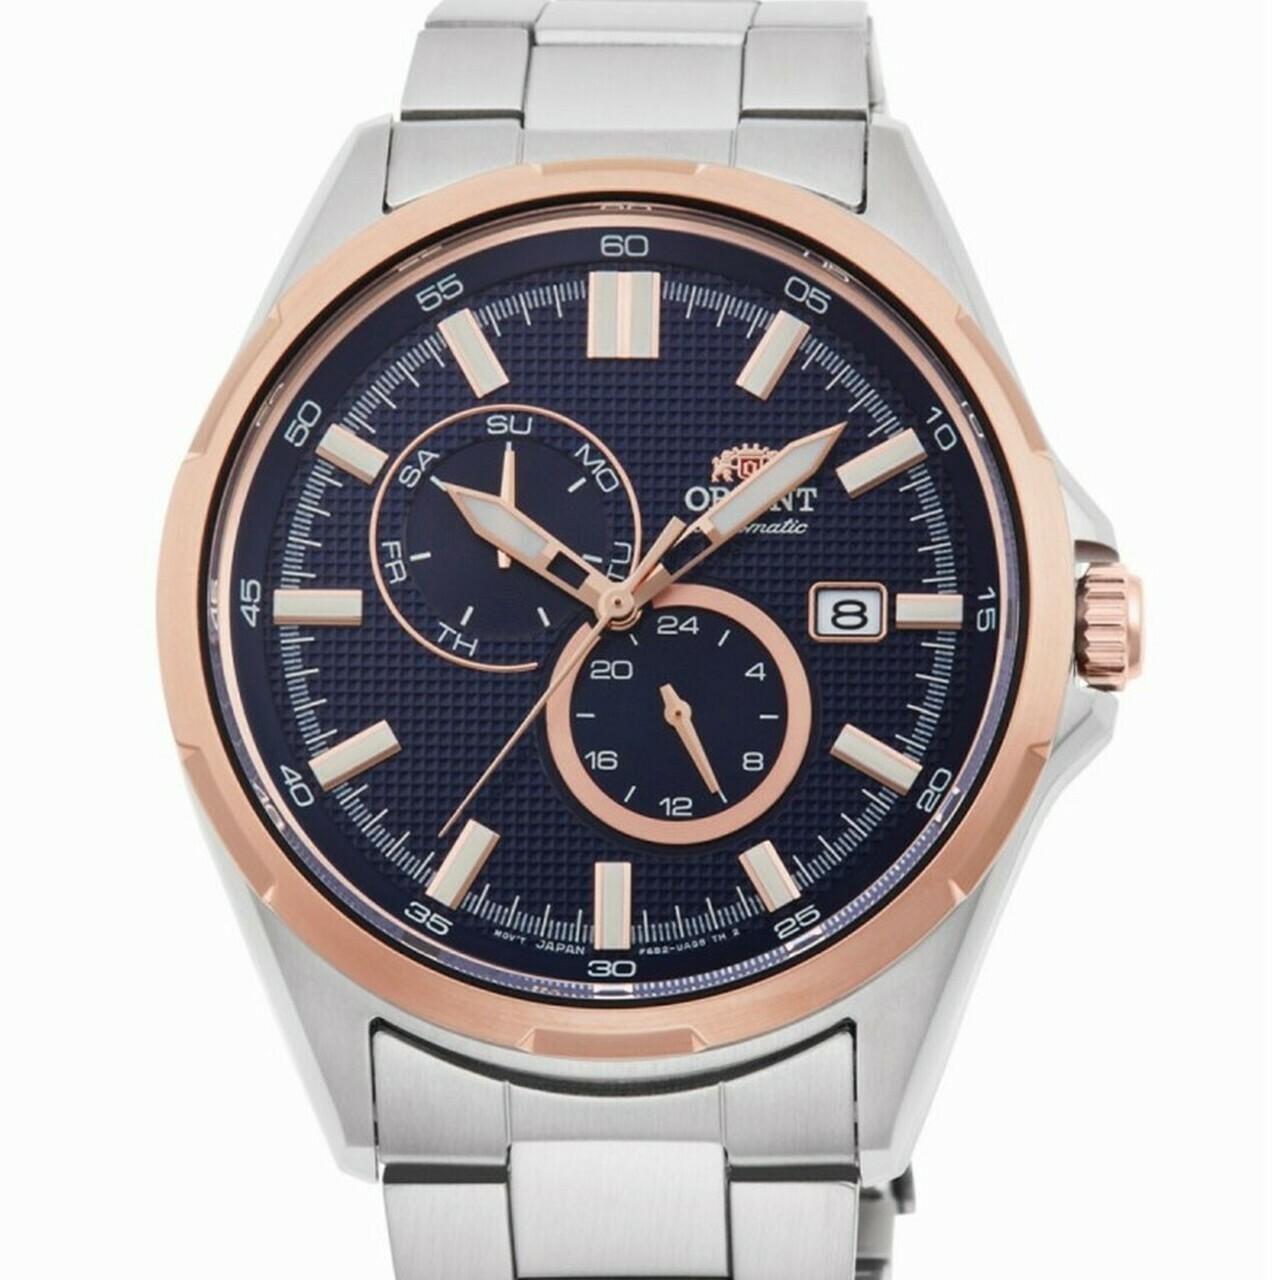 Reloj Automático Hombre Orient Defender RA-AK0601L Hand Hacking / Self-winding  rose gold tone blue dial